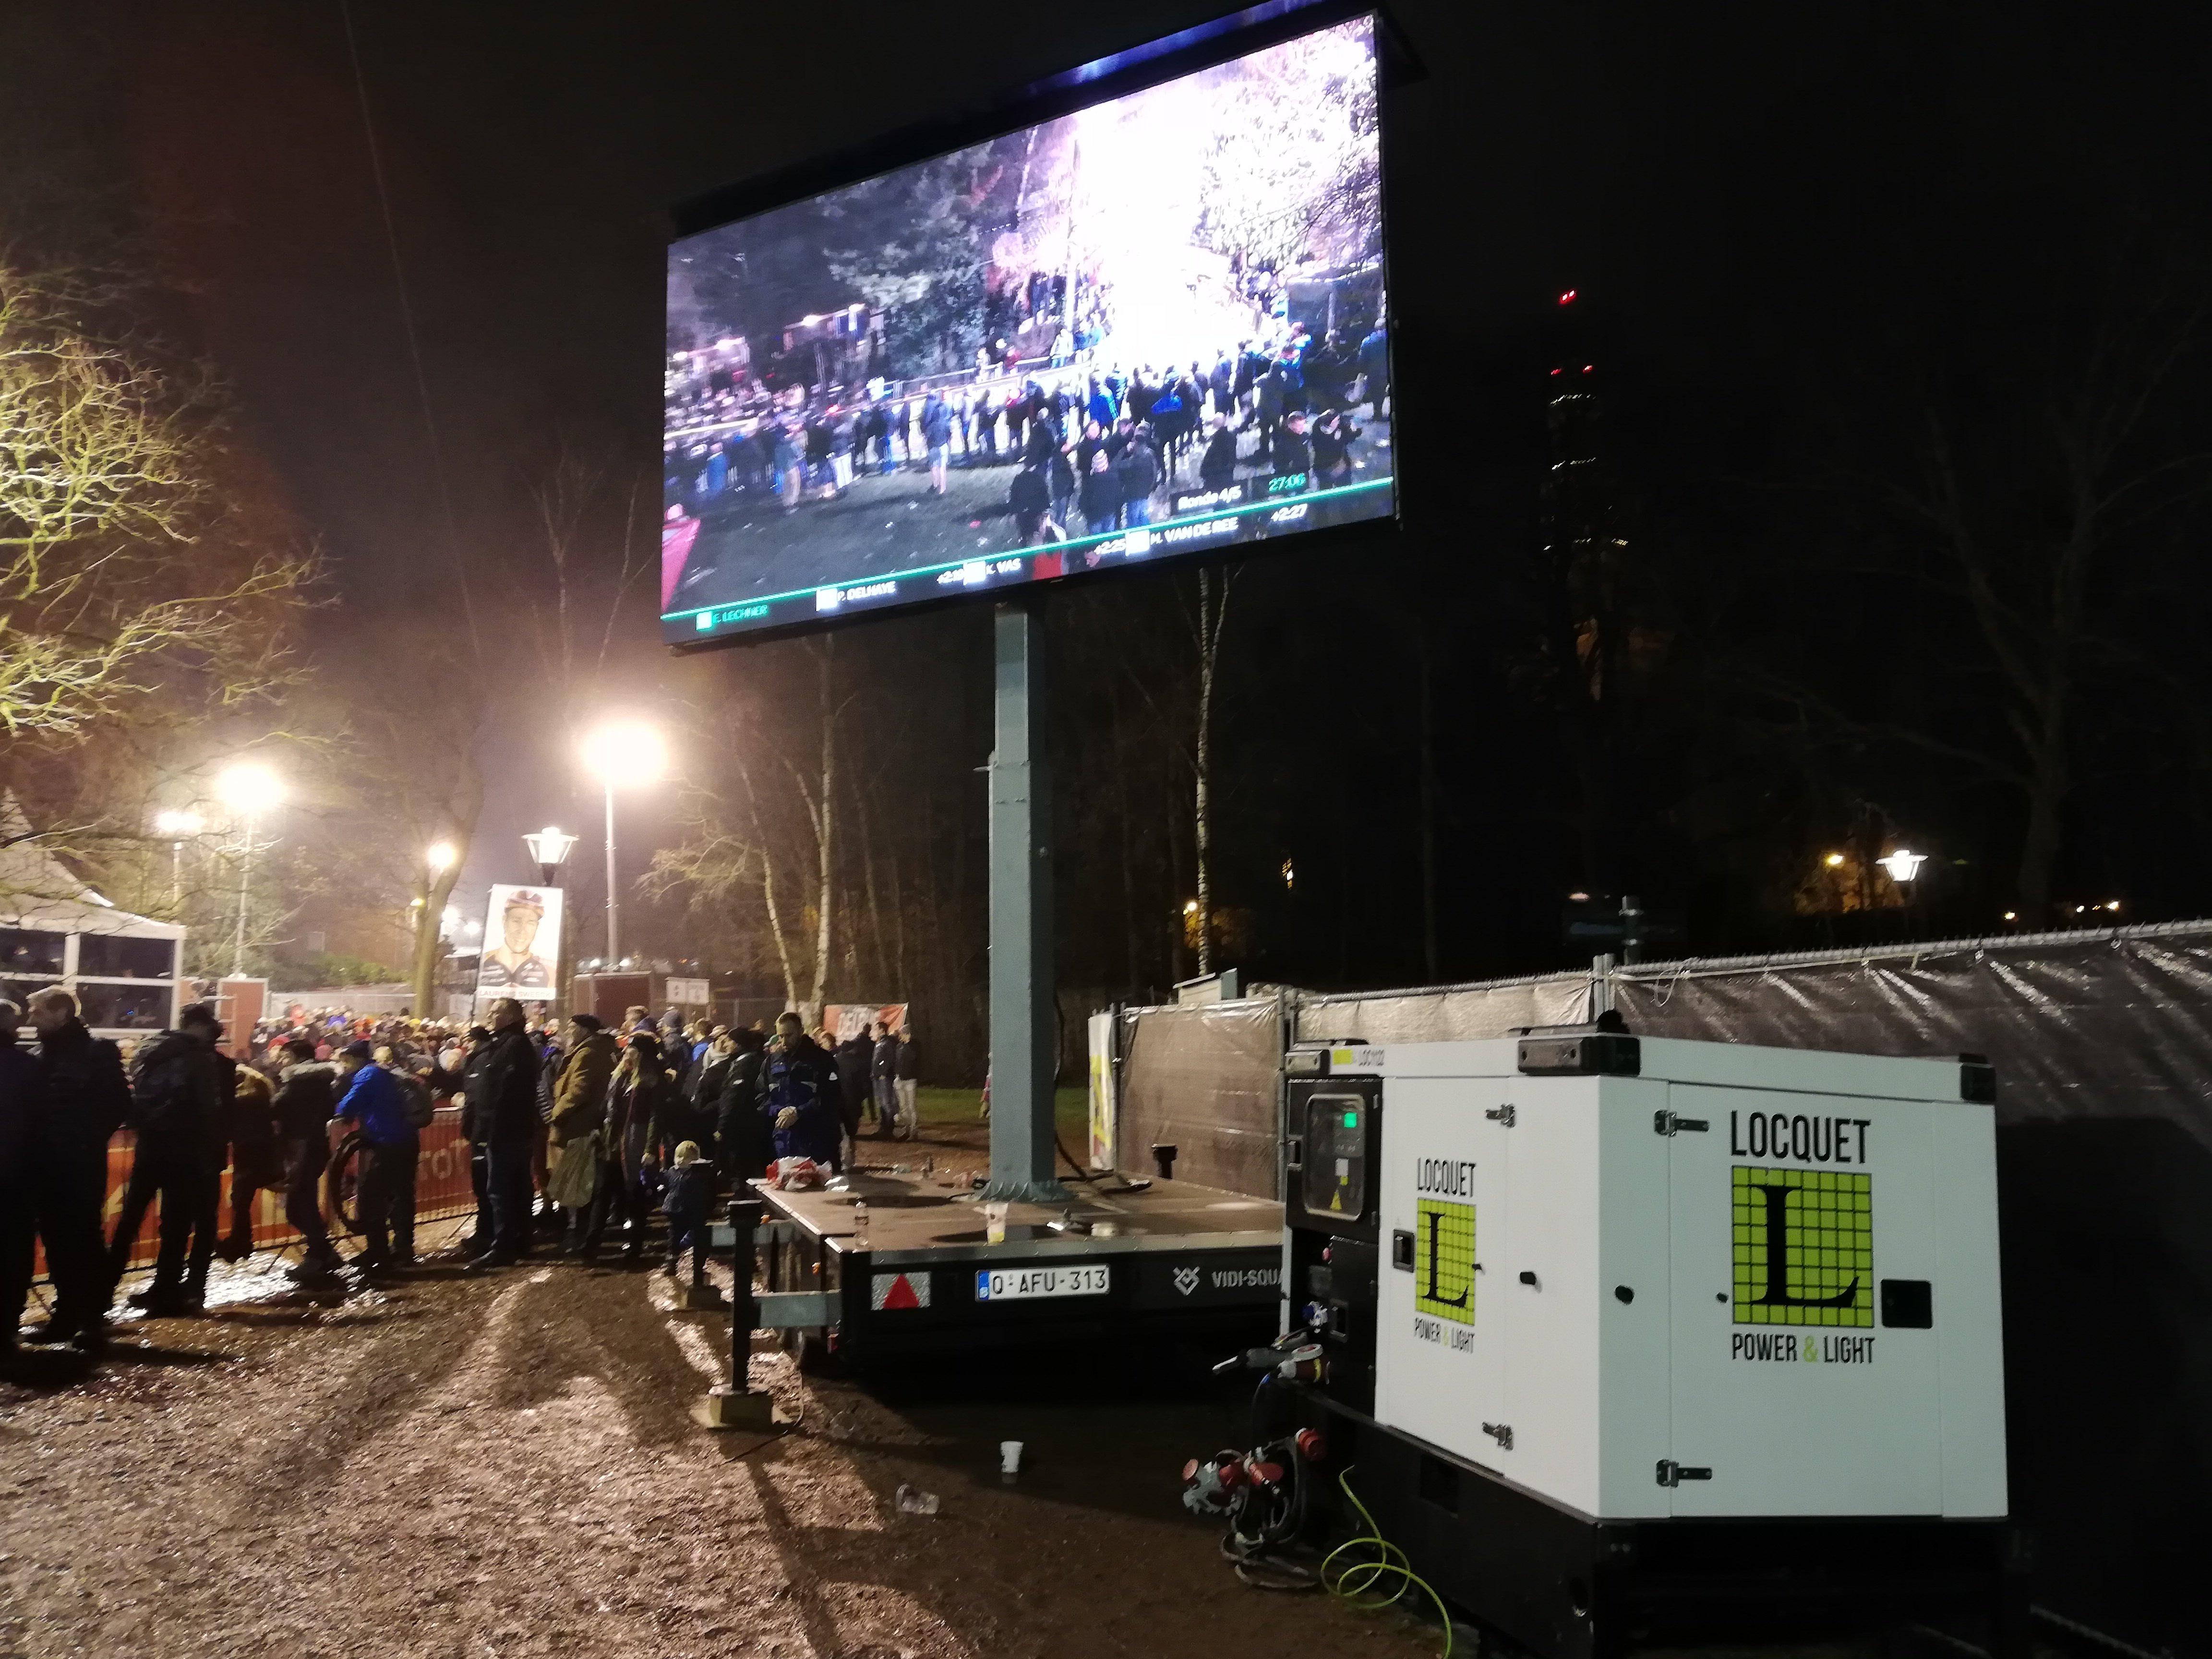 Superprestige Diegem 2018 - generator 45-50 kVA voeden mobiel LED-scherm.jpg